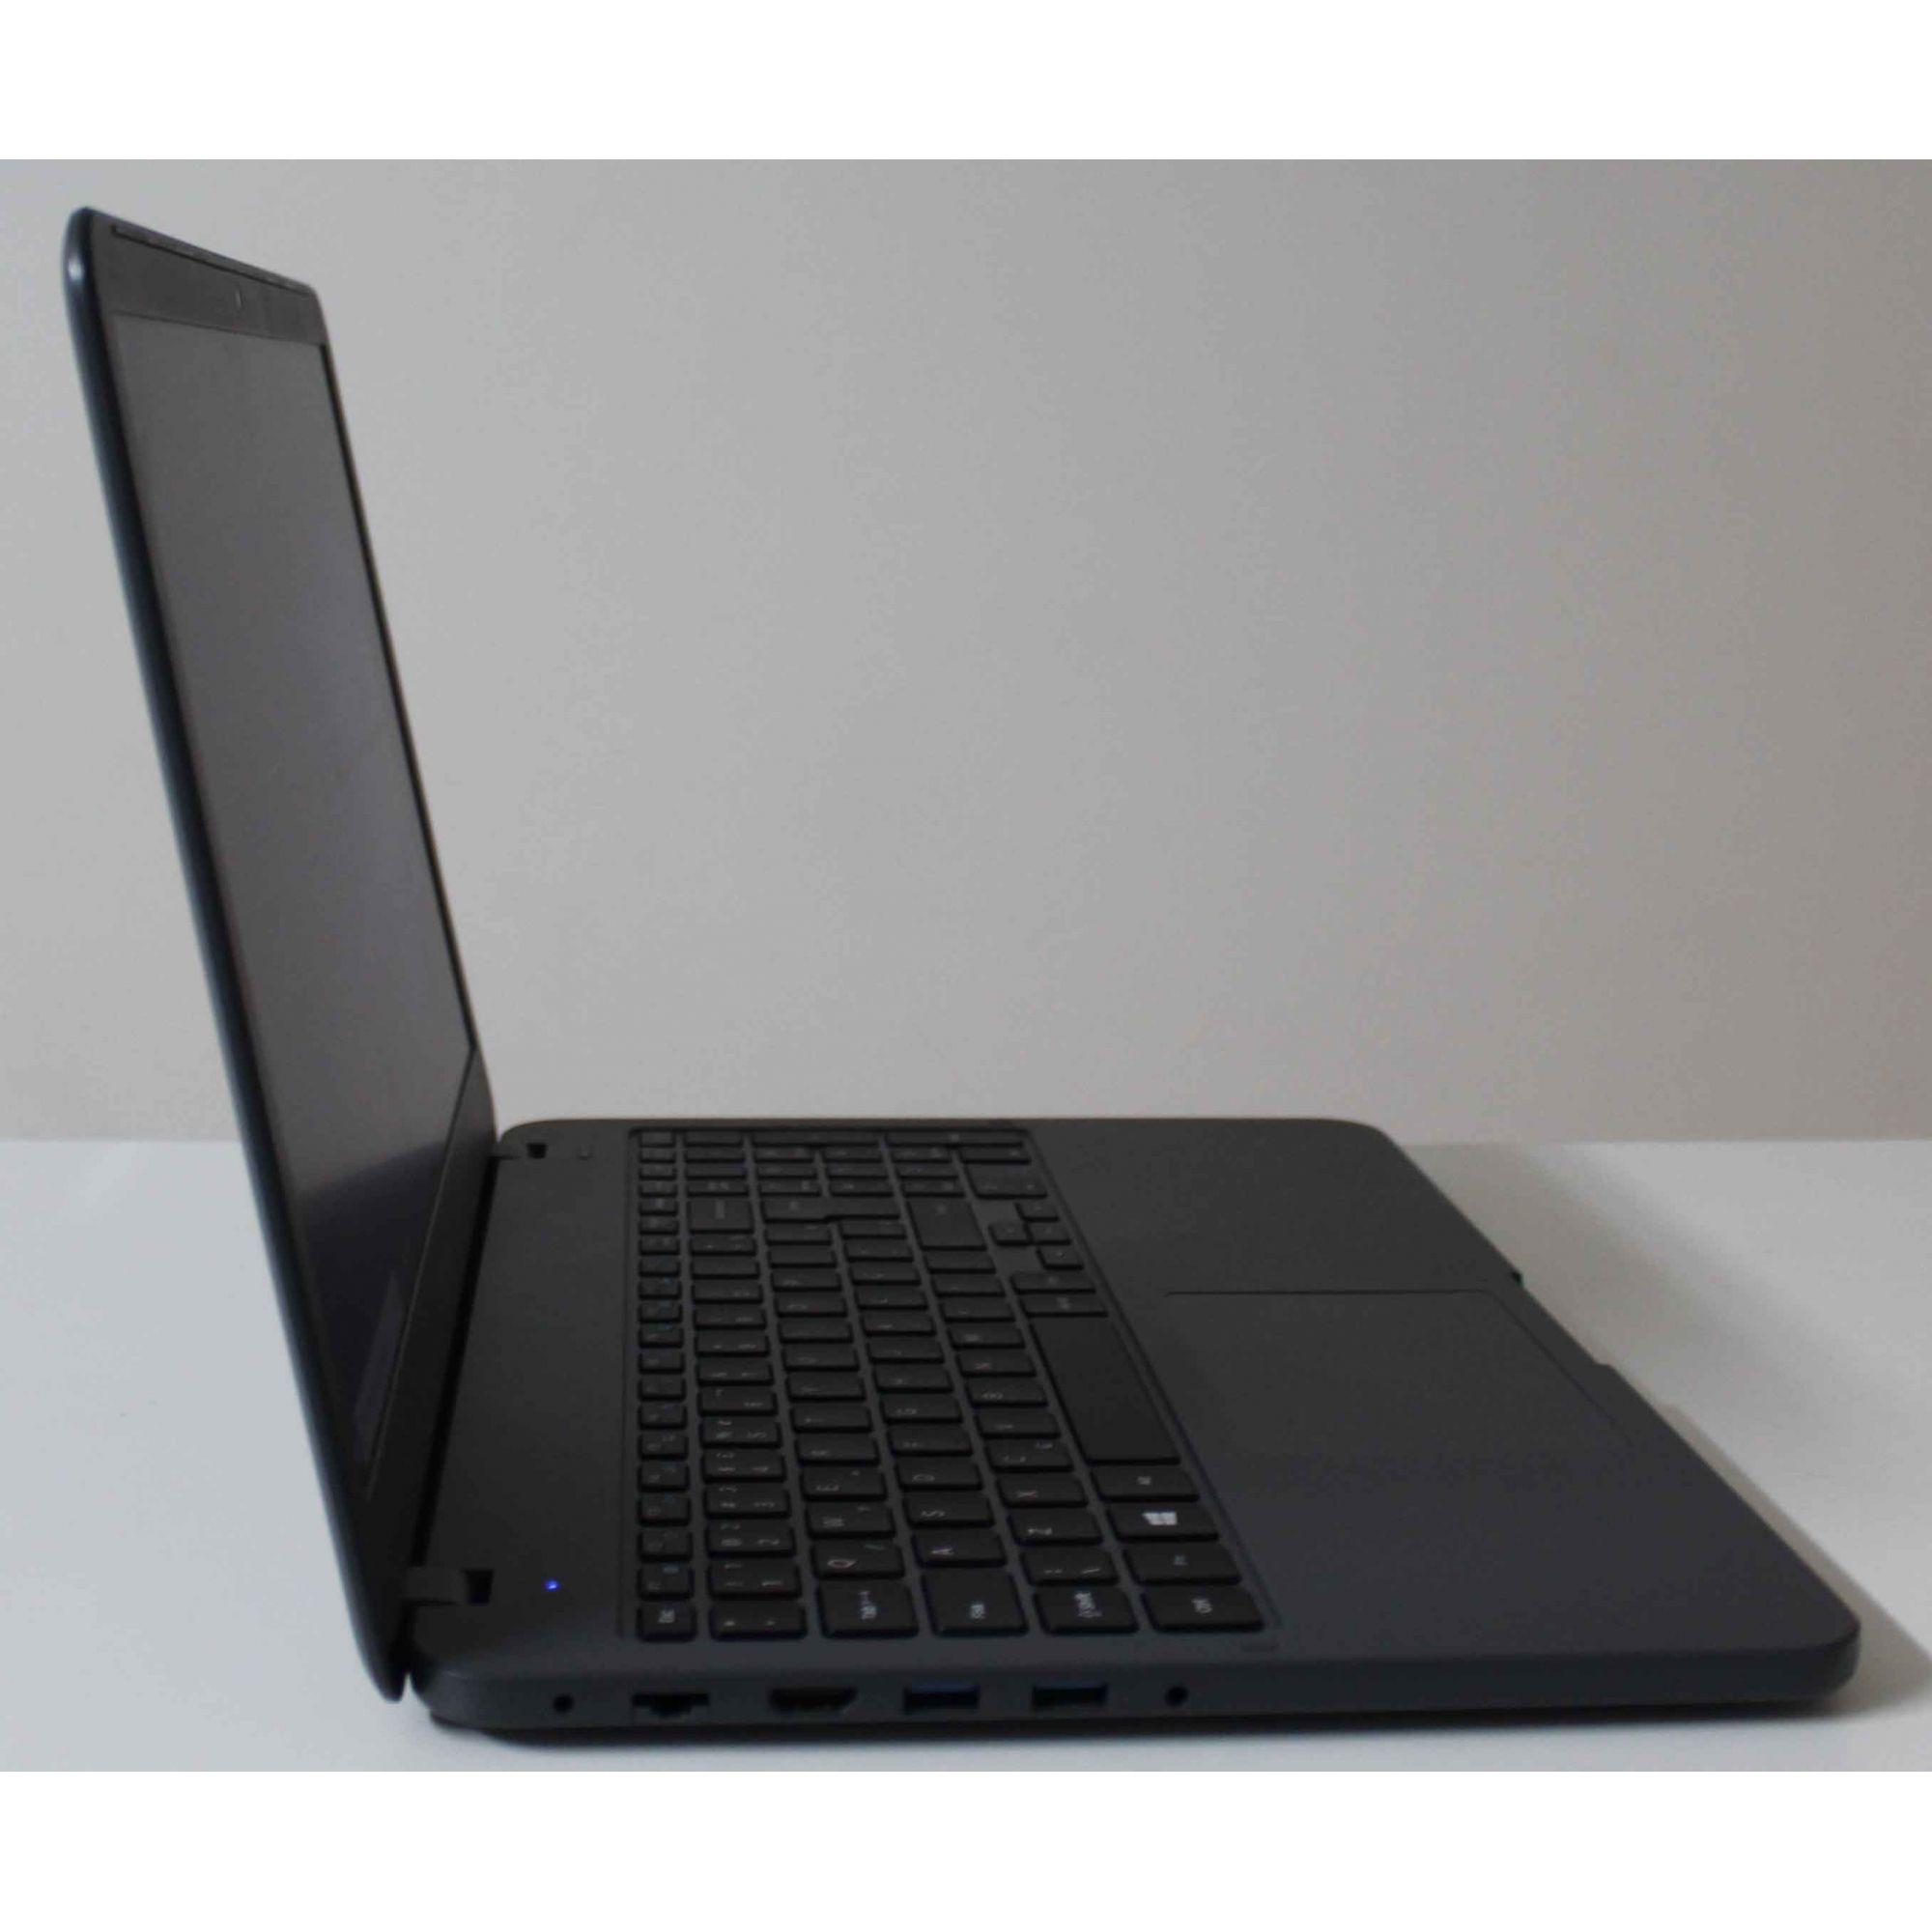 Notebook Samsung NP350XAA 15.6'' Intel Core i5 2.5GHz 8GB HD-1TB + Alphanumérico